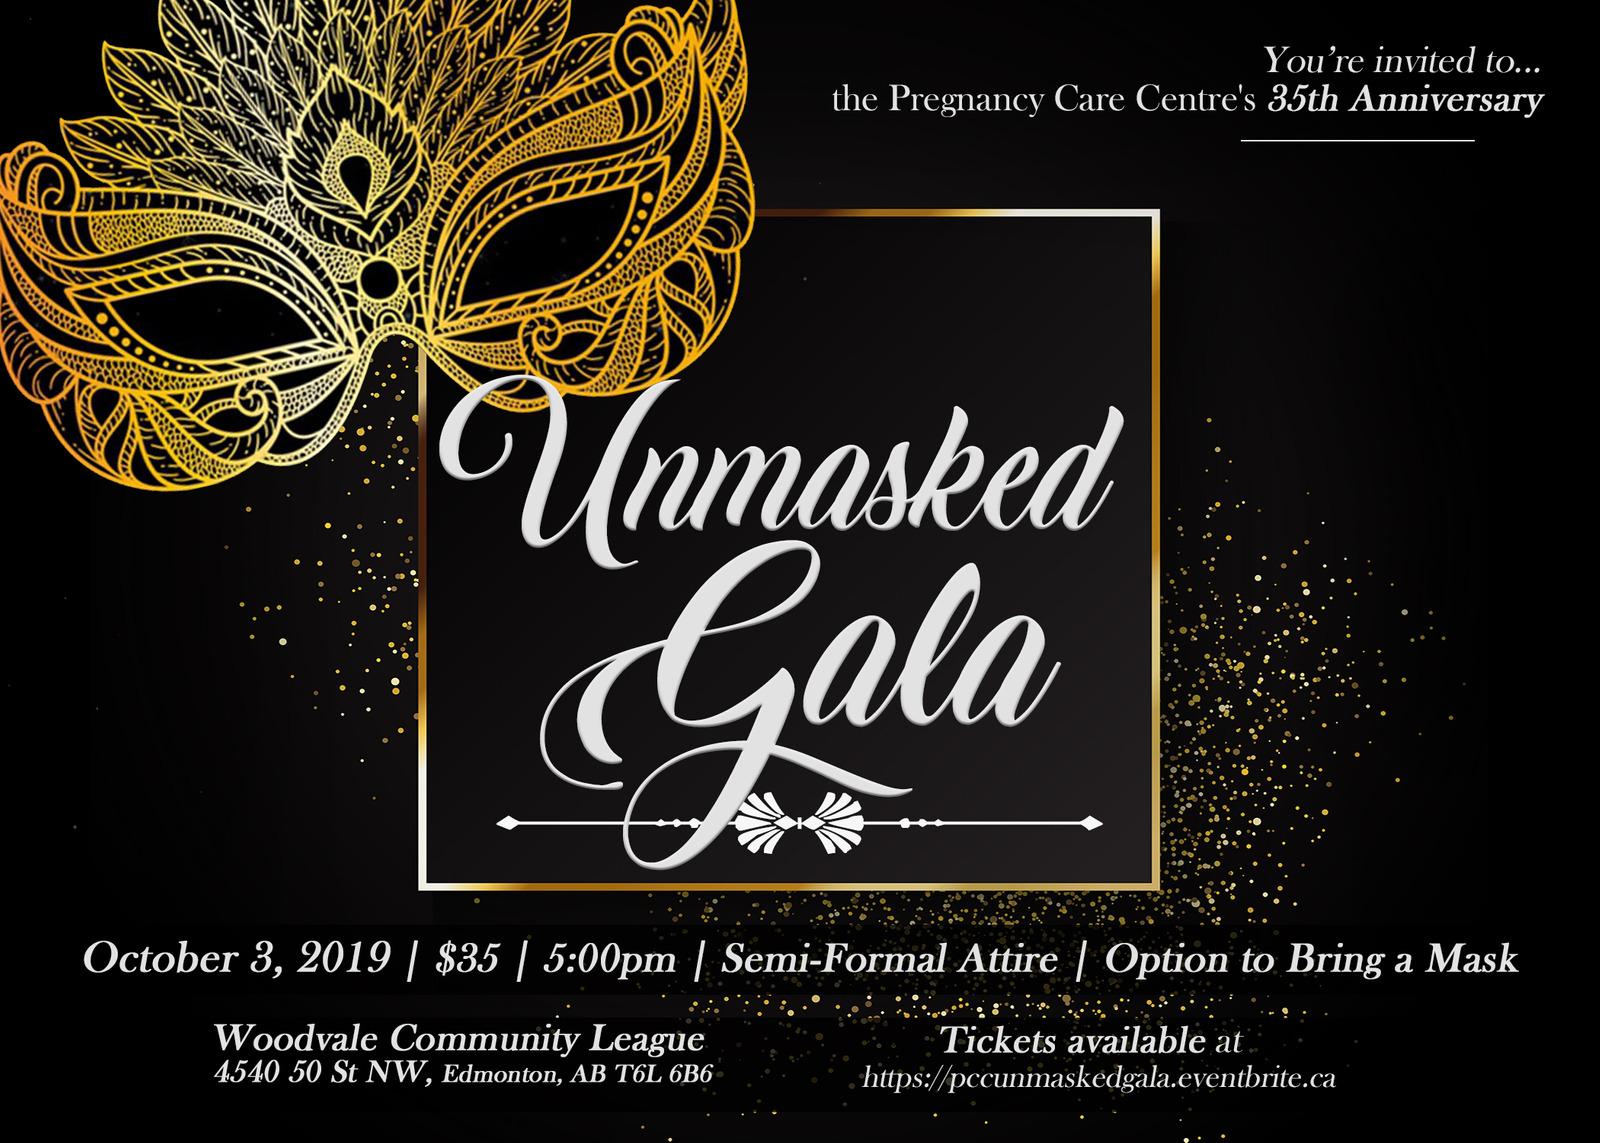 Unmasked Gala Edmonton 2019